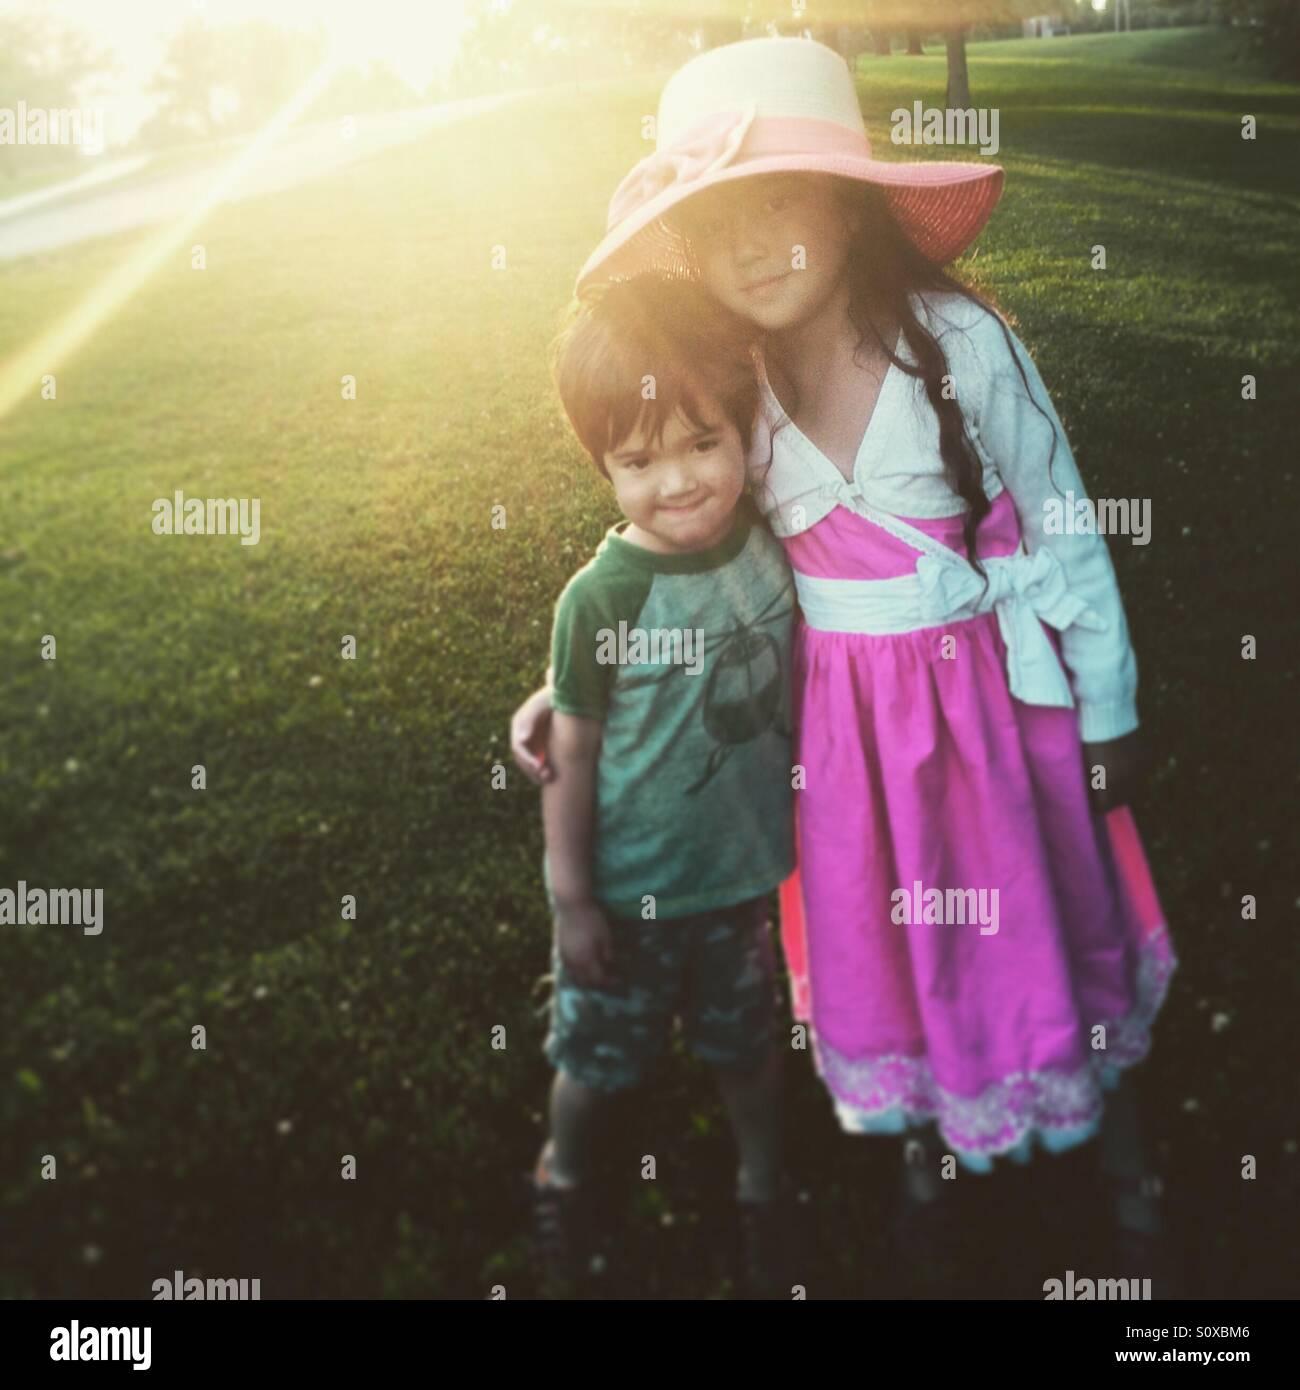 Hermano y hermana al atardecer Imagen De Stock